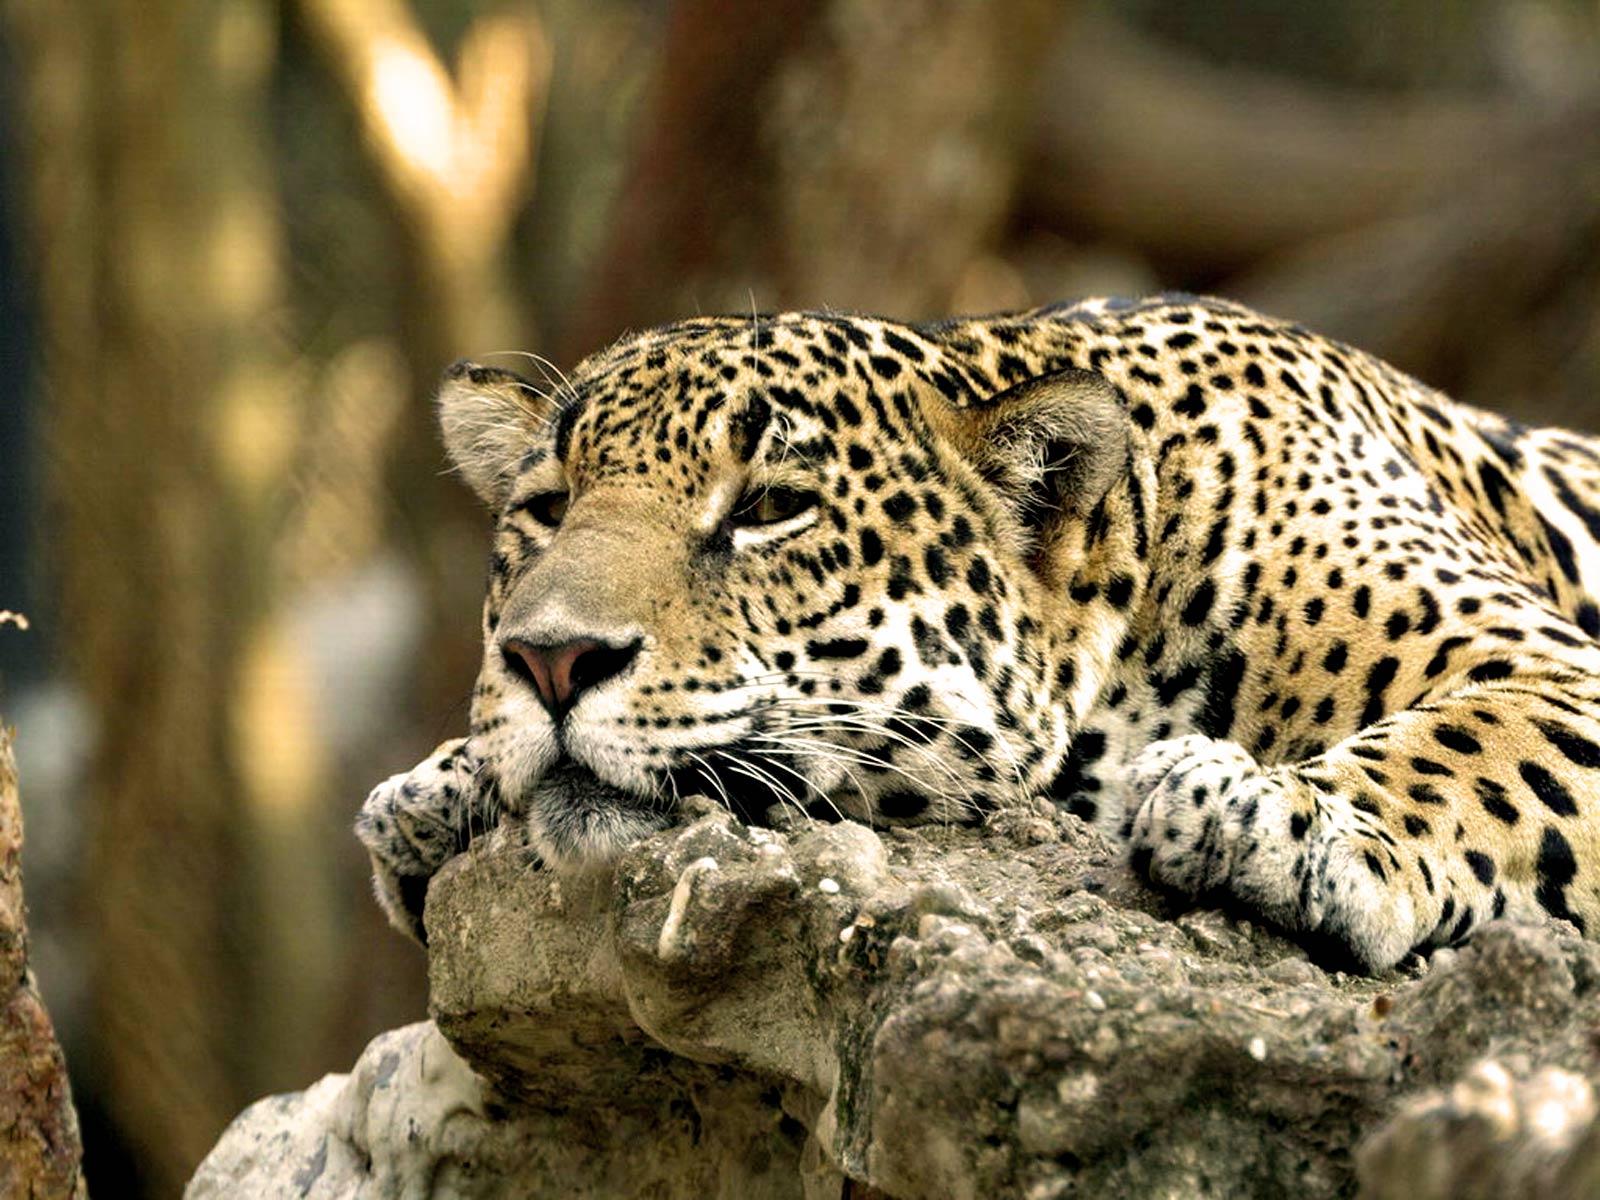 Leopard Africa HD Wallpaper High Quality WallpapersWallpaper 1600x1200